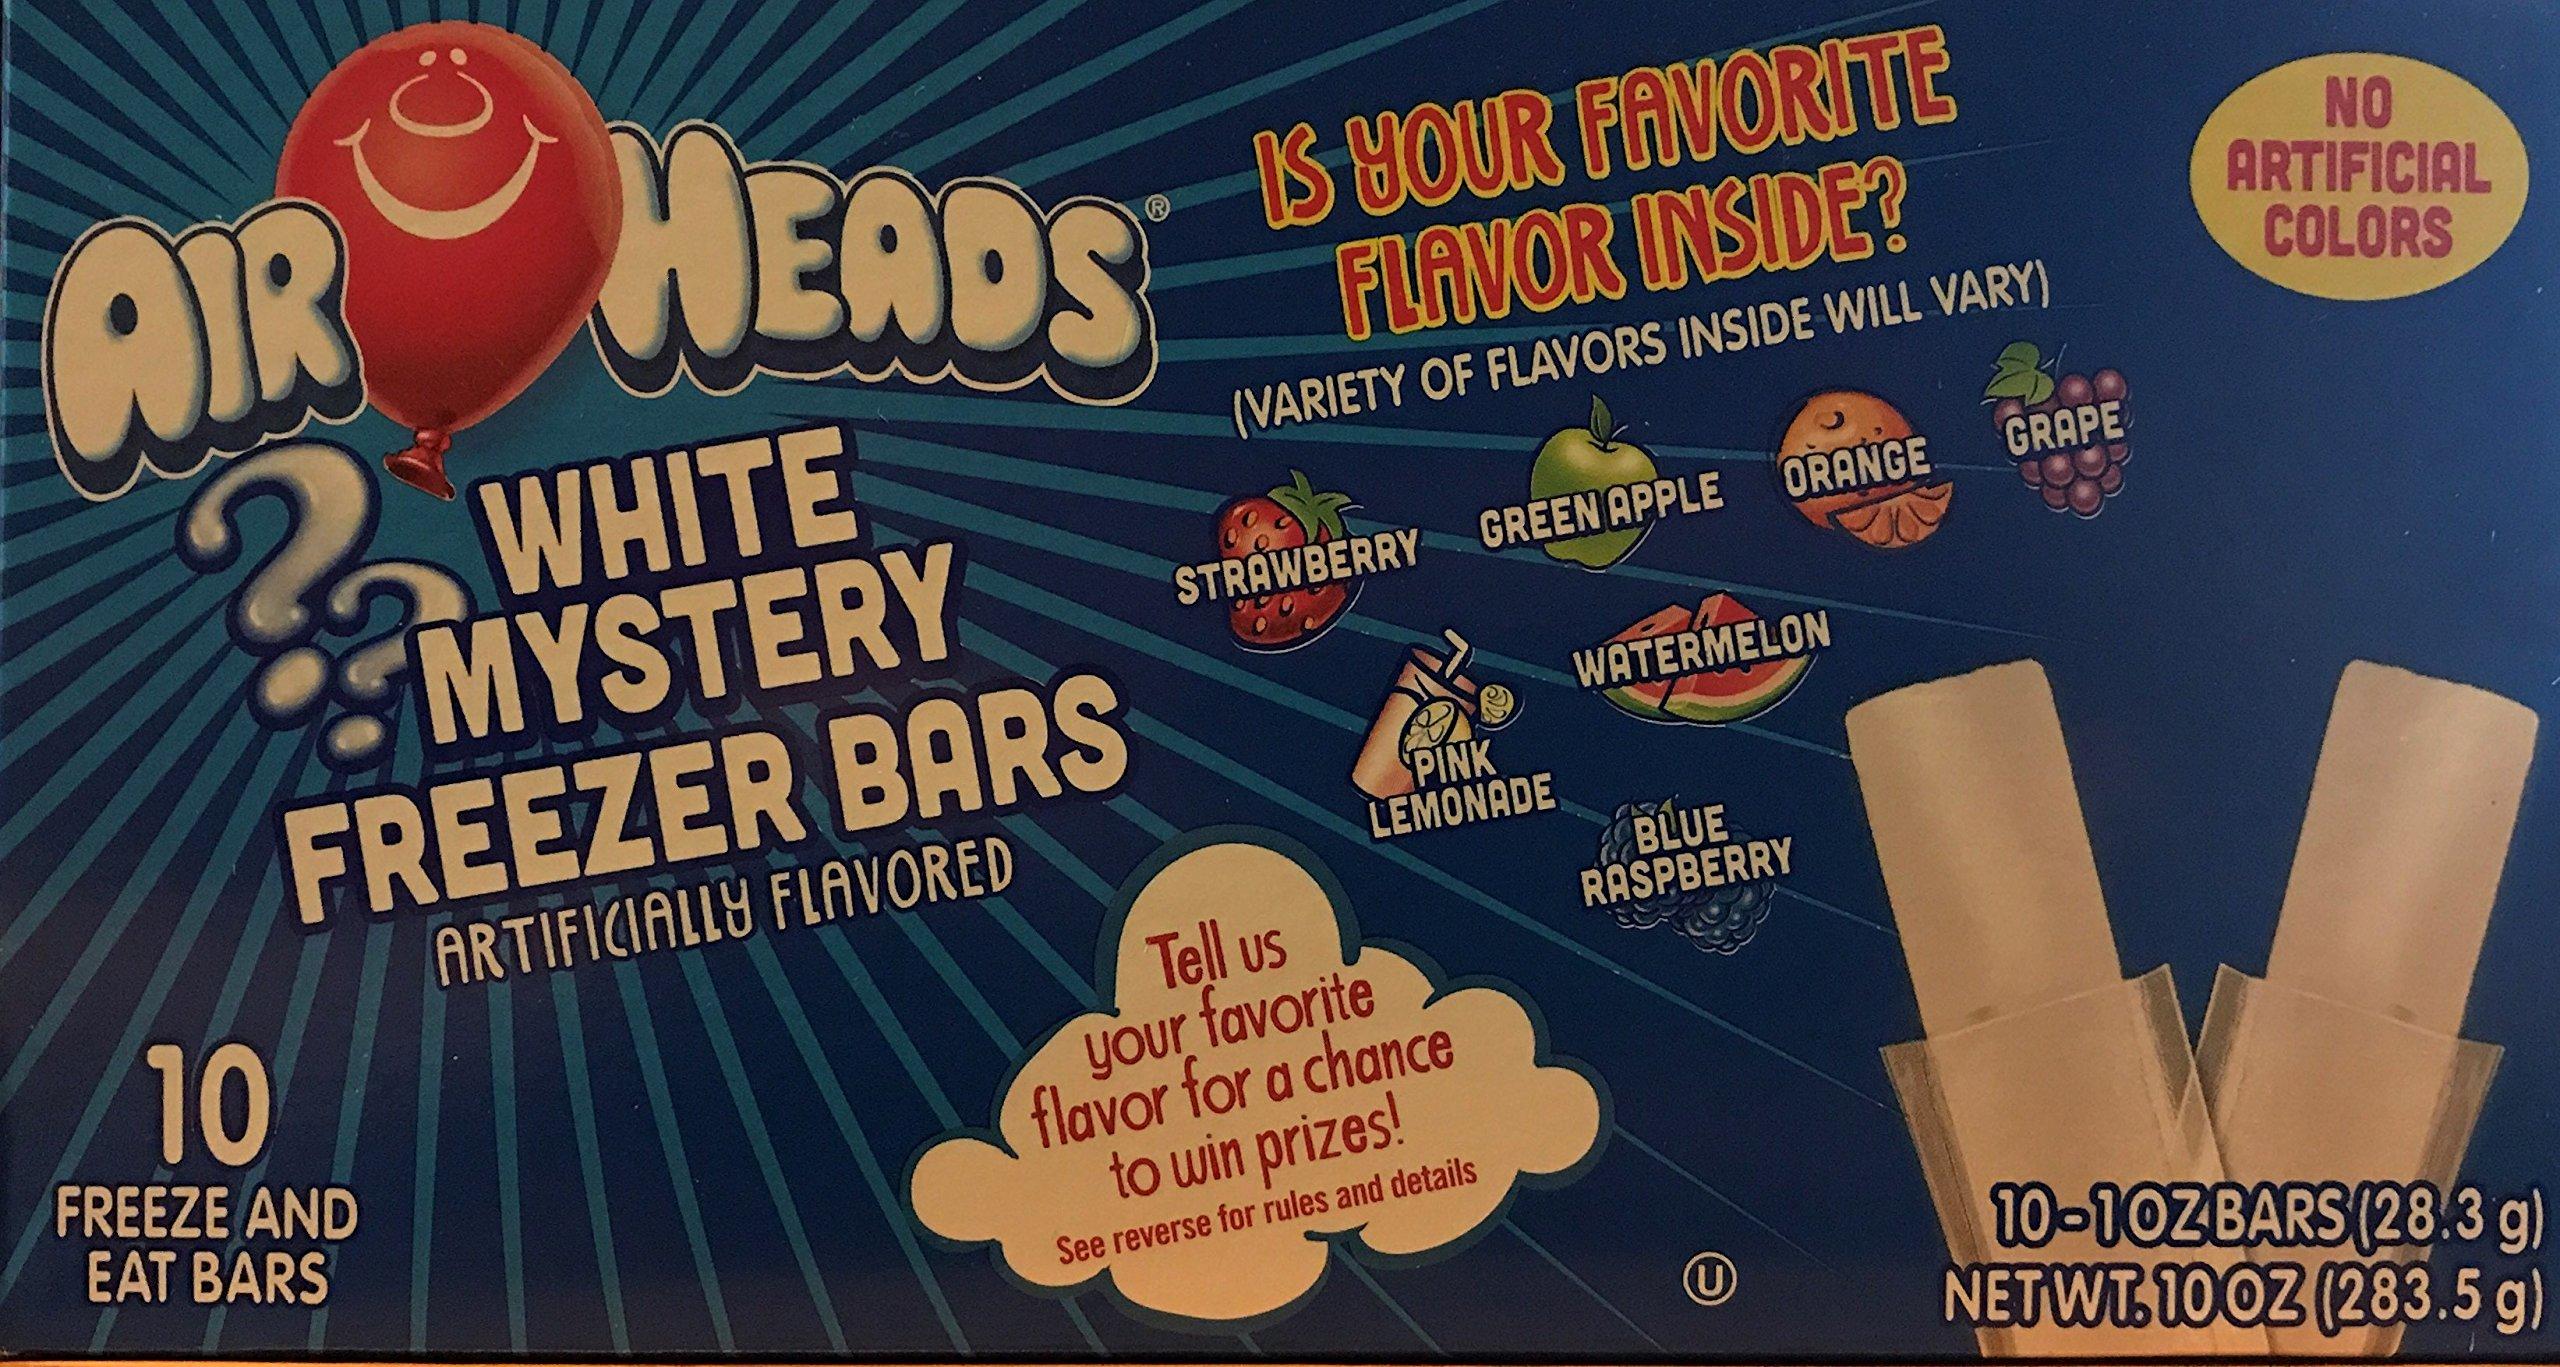 Air Heads White Mystery Freezer Bars! Strawberry! Greenapple! Orange! Grape! Pink Lemonade! Watermelon! Blue Raspberry! 10-1oz Bars!